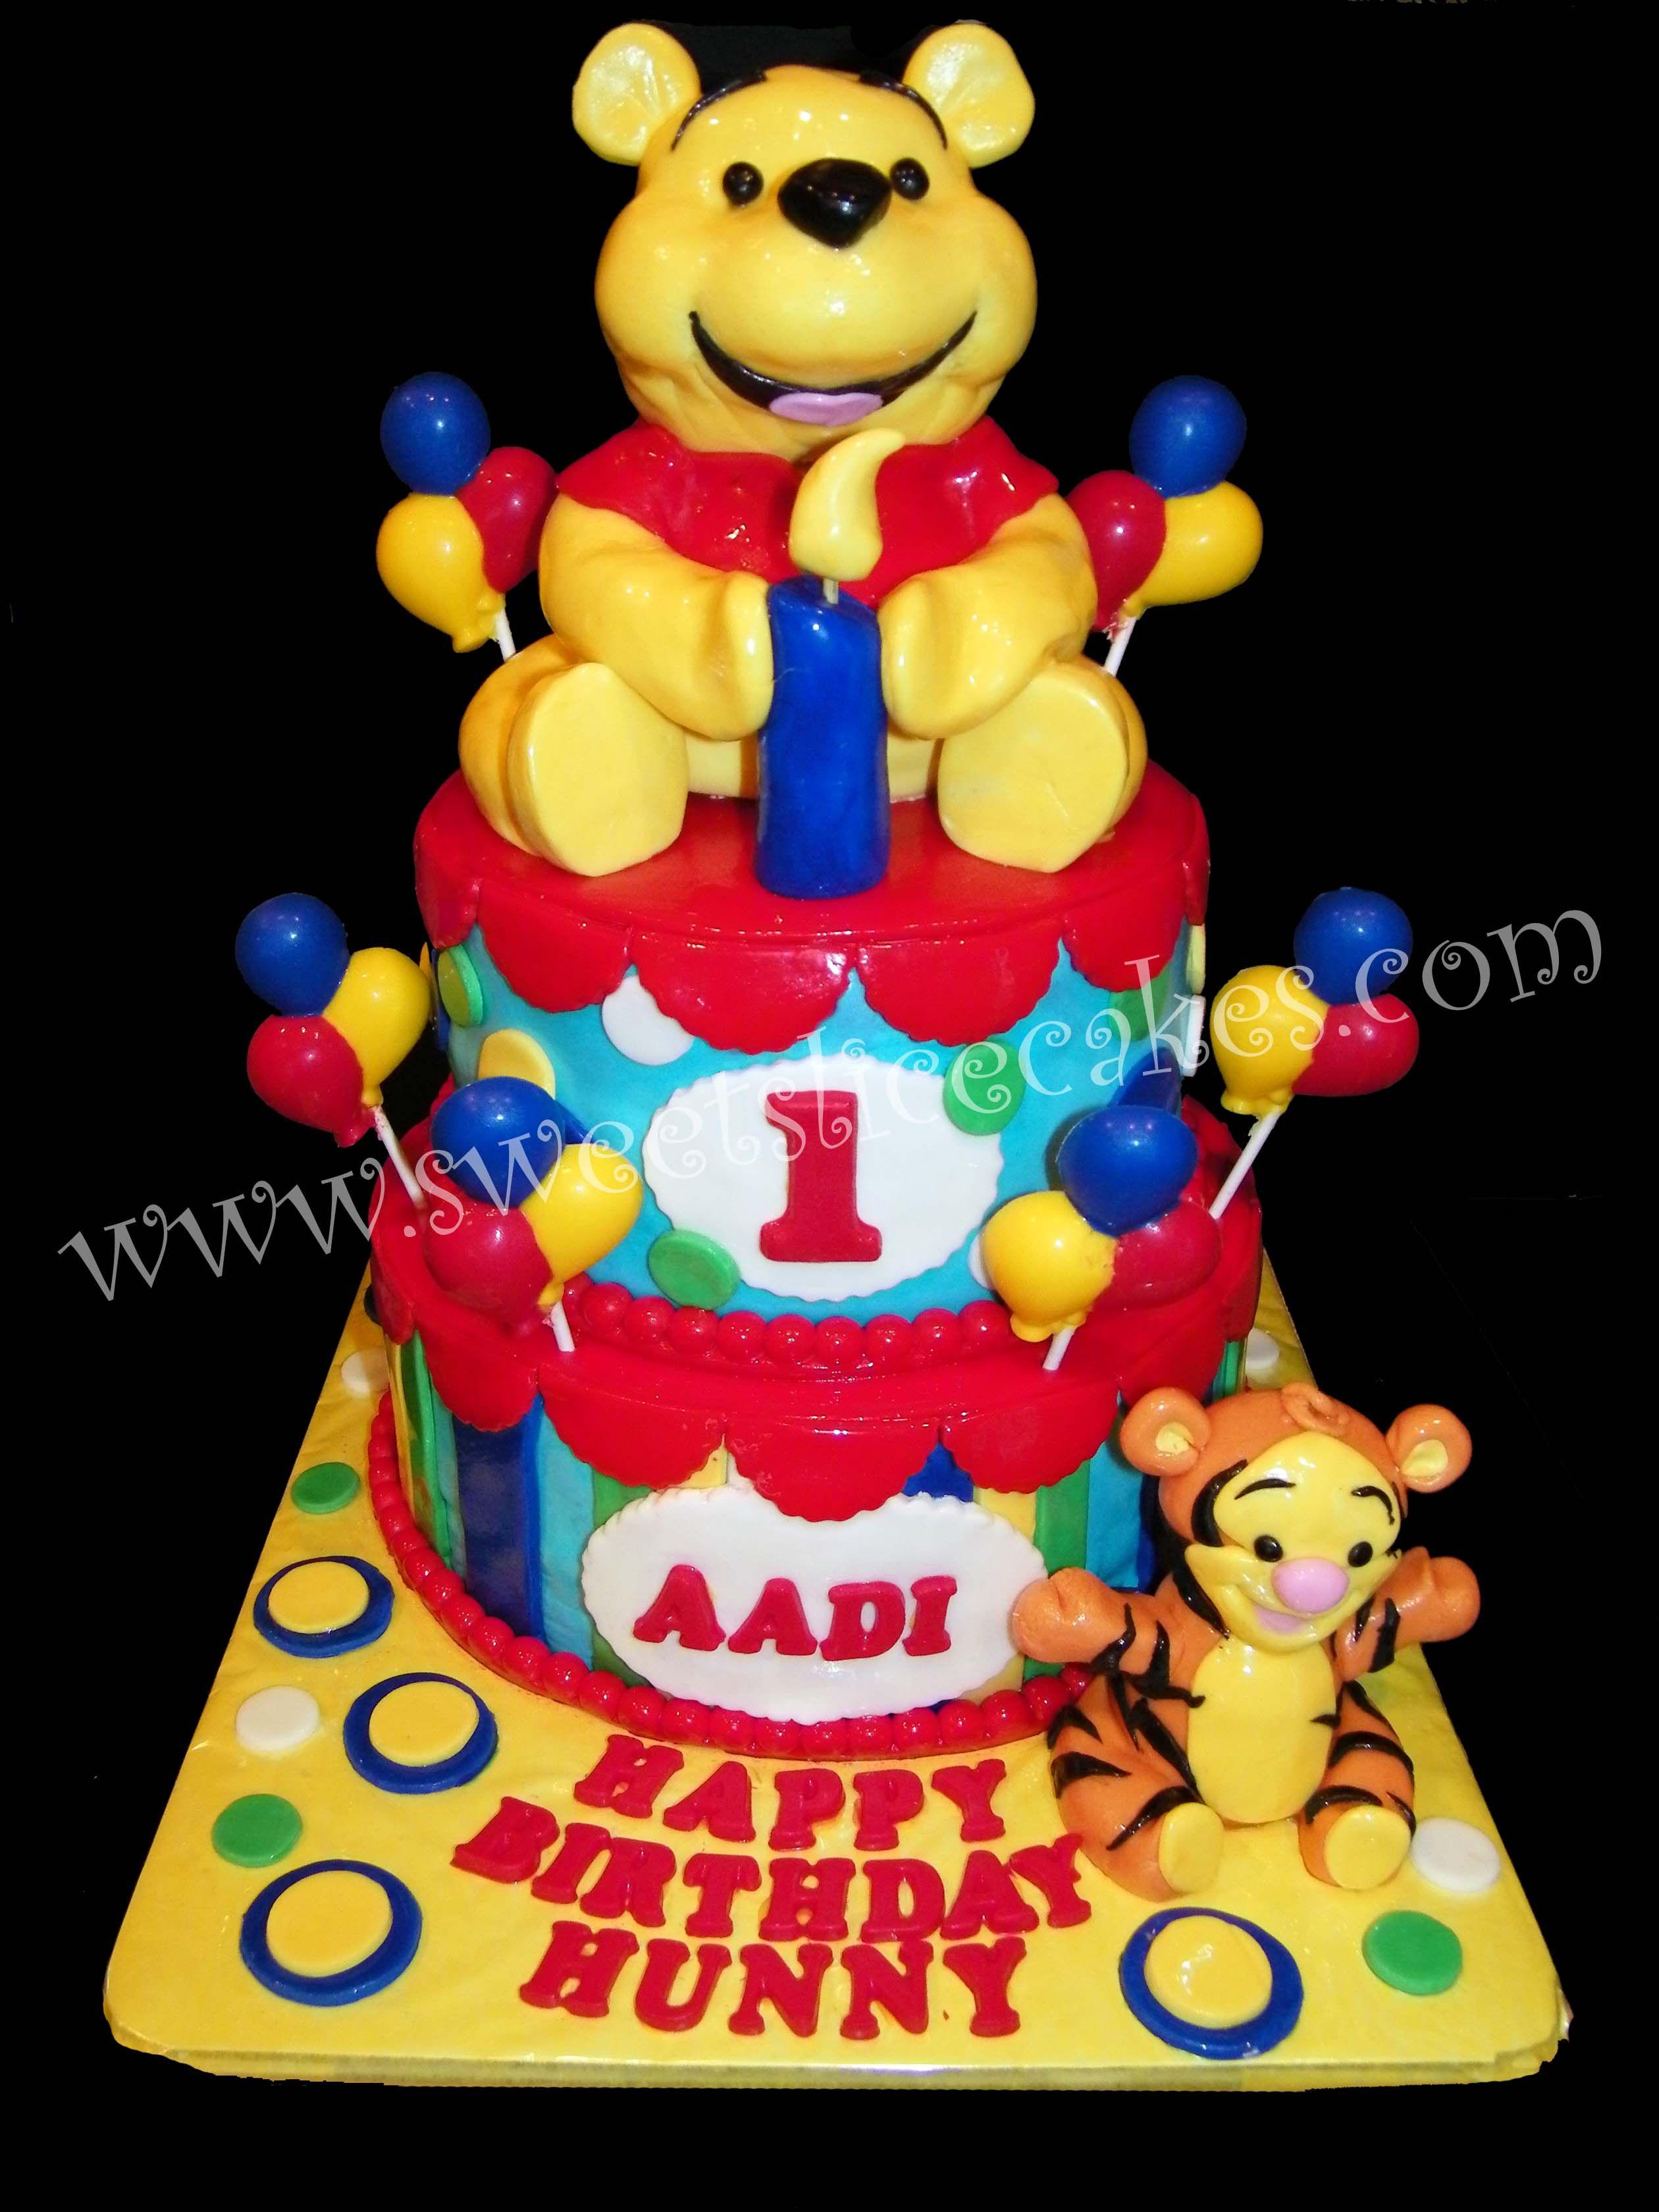 Baby Pooh & Tigger 1st Birthday! All Edible!